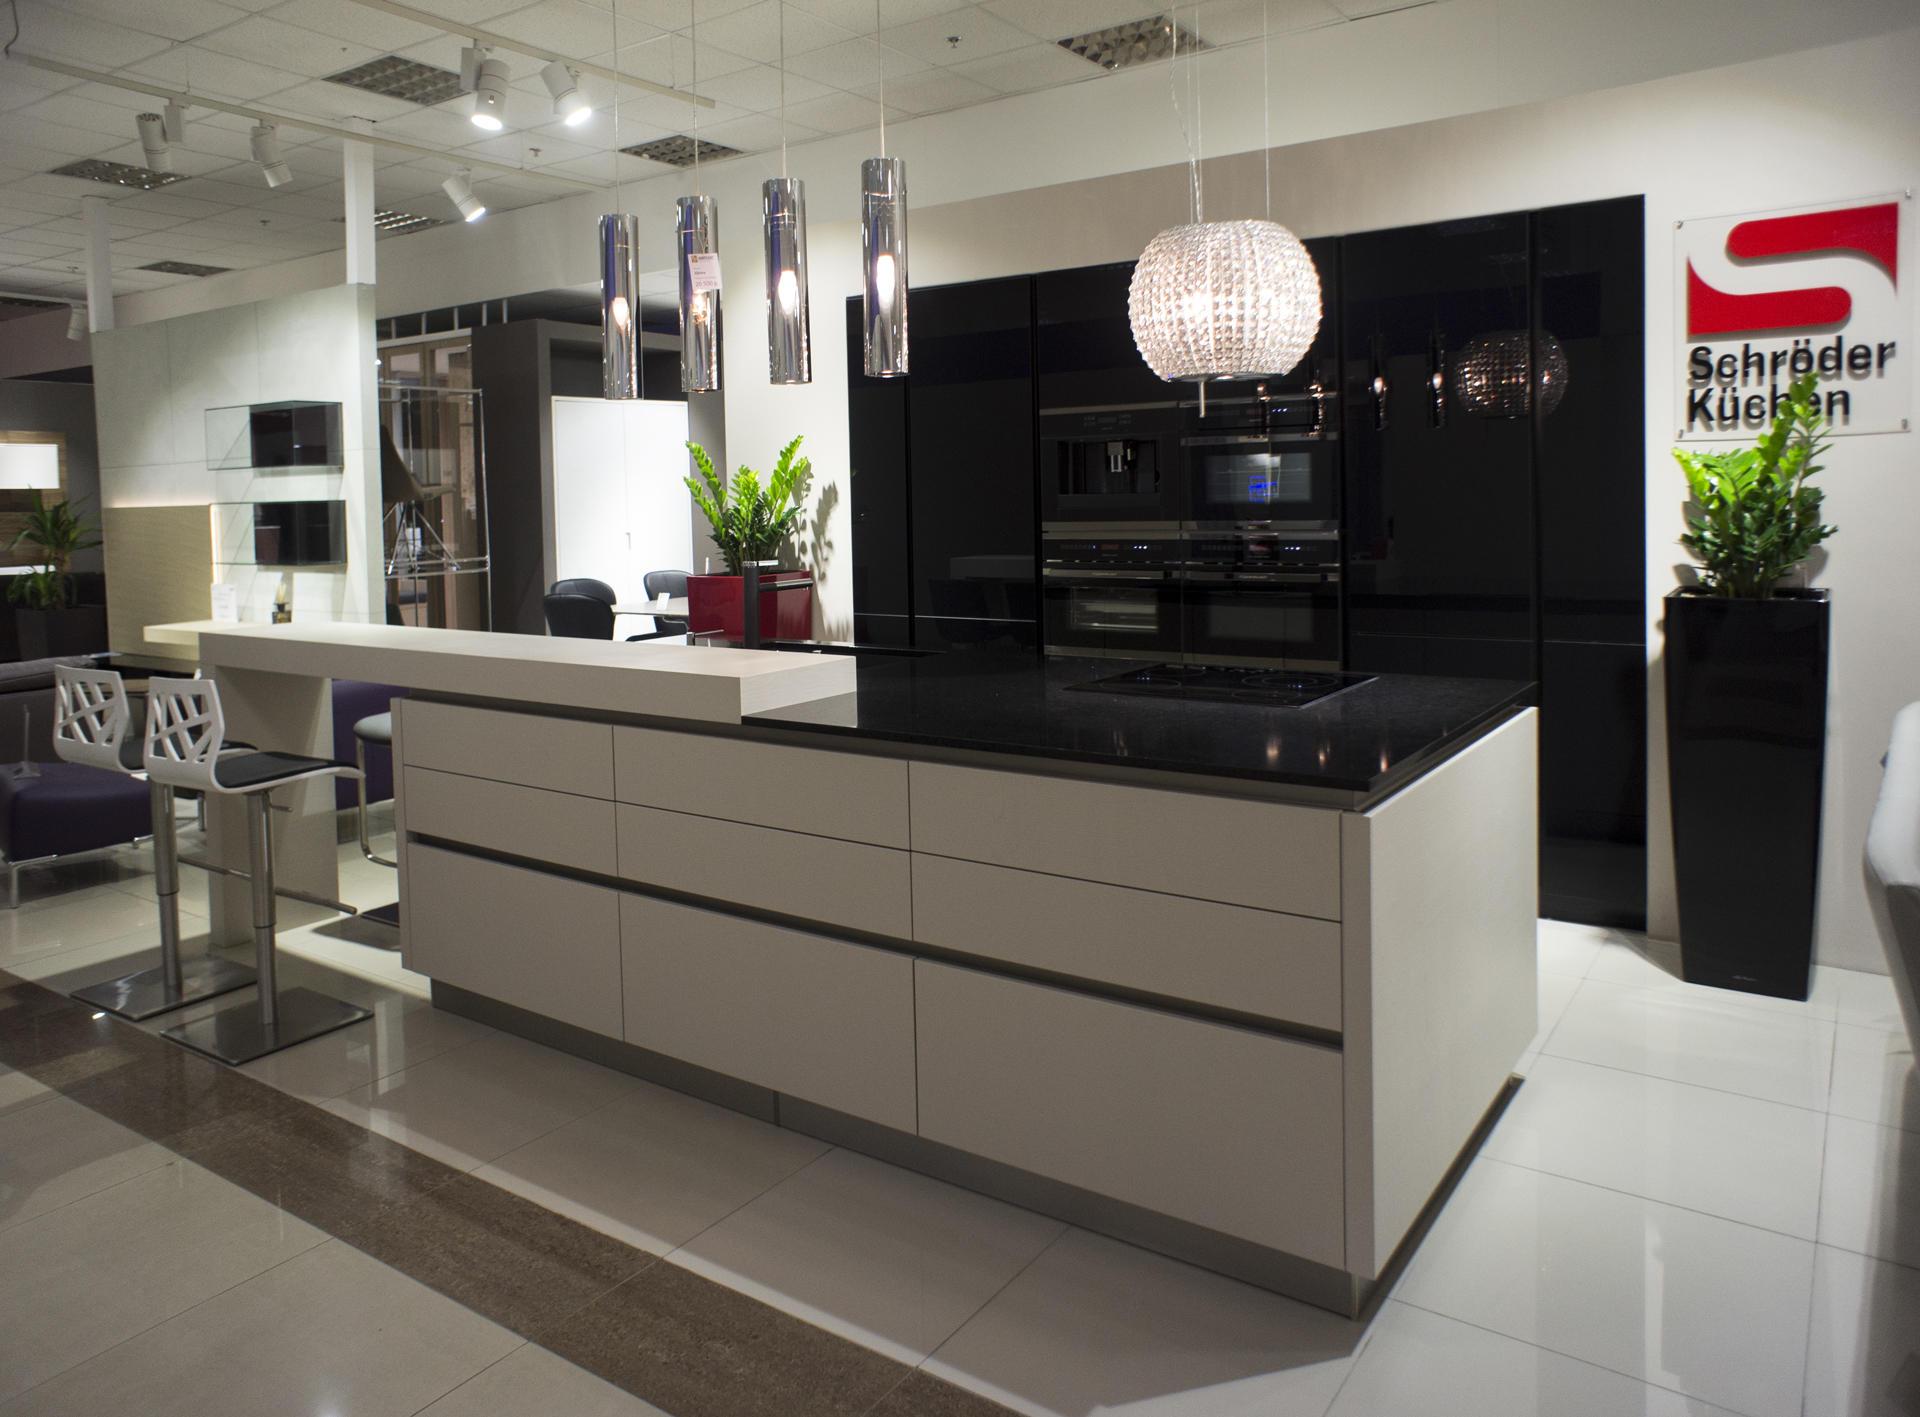 Кухня Schröder Acryl Black & Matrix Magnolie